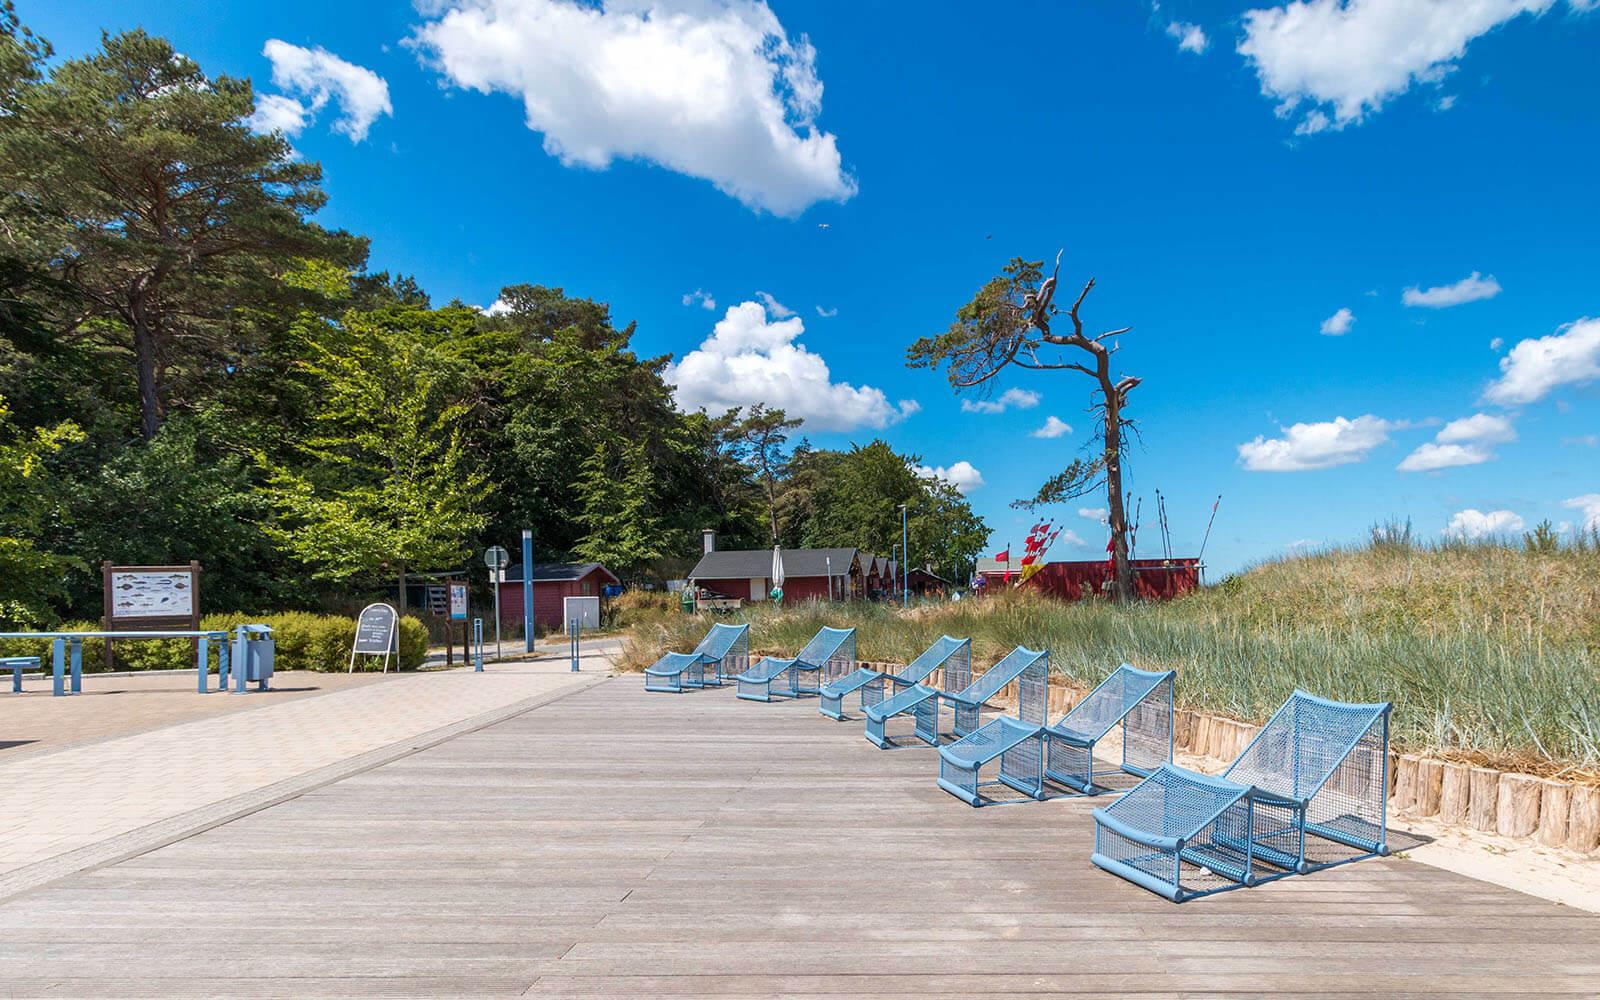 Atrakcja wHeringsdorf wyspa uznam